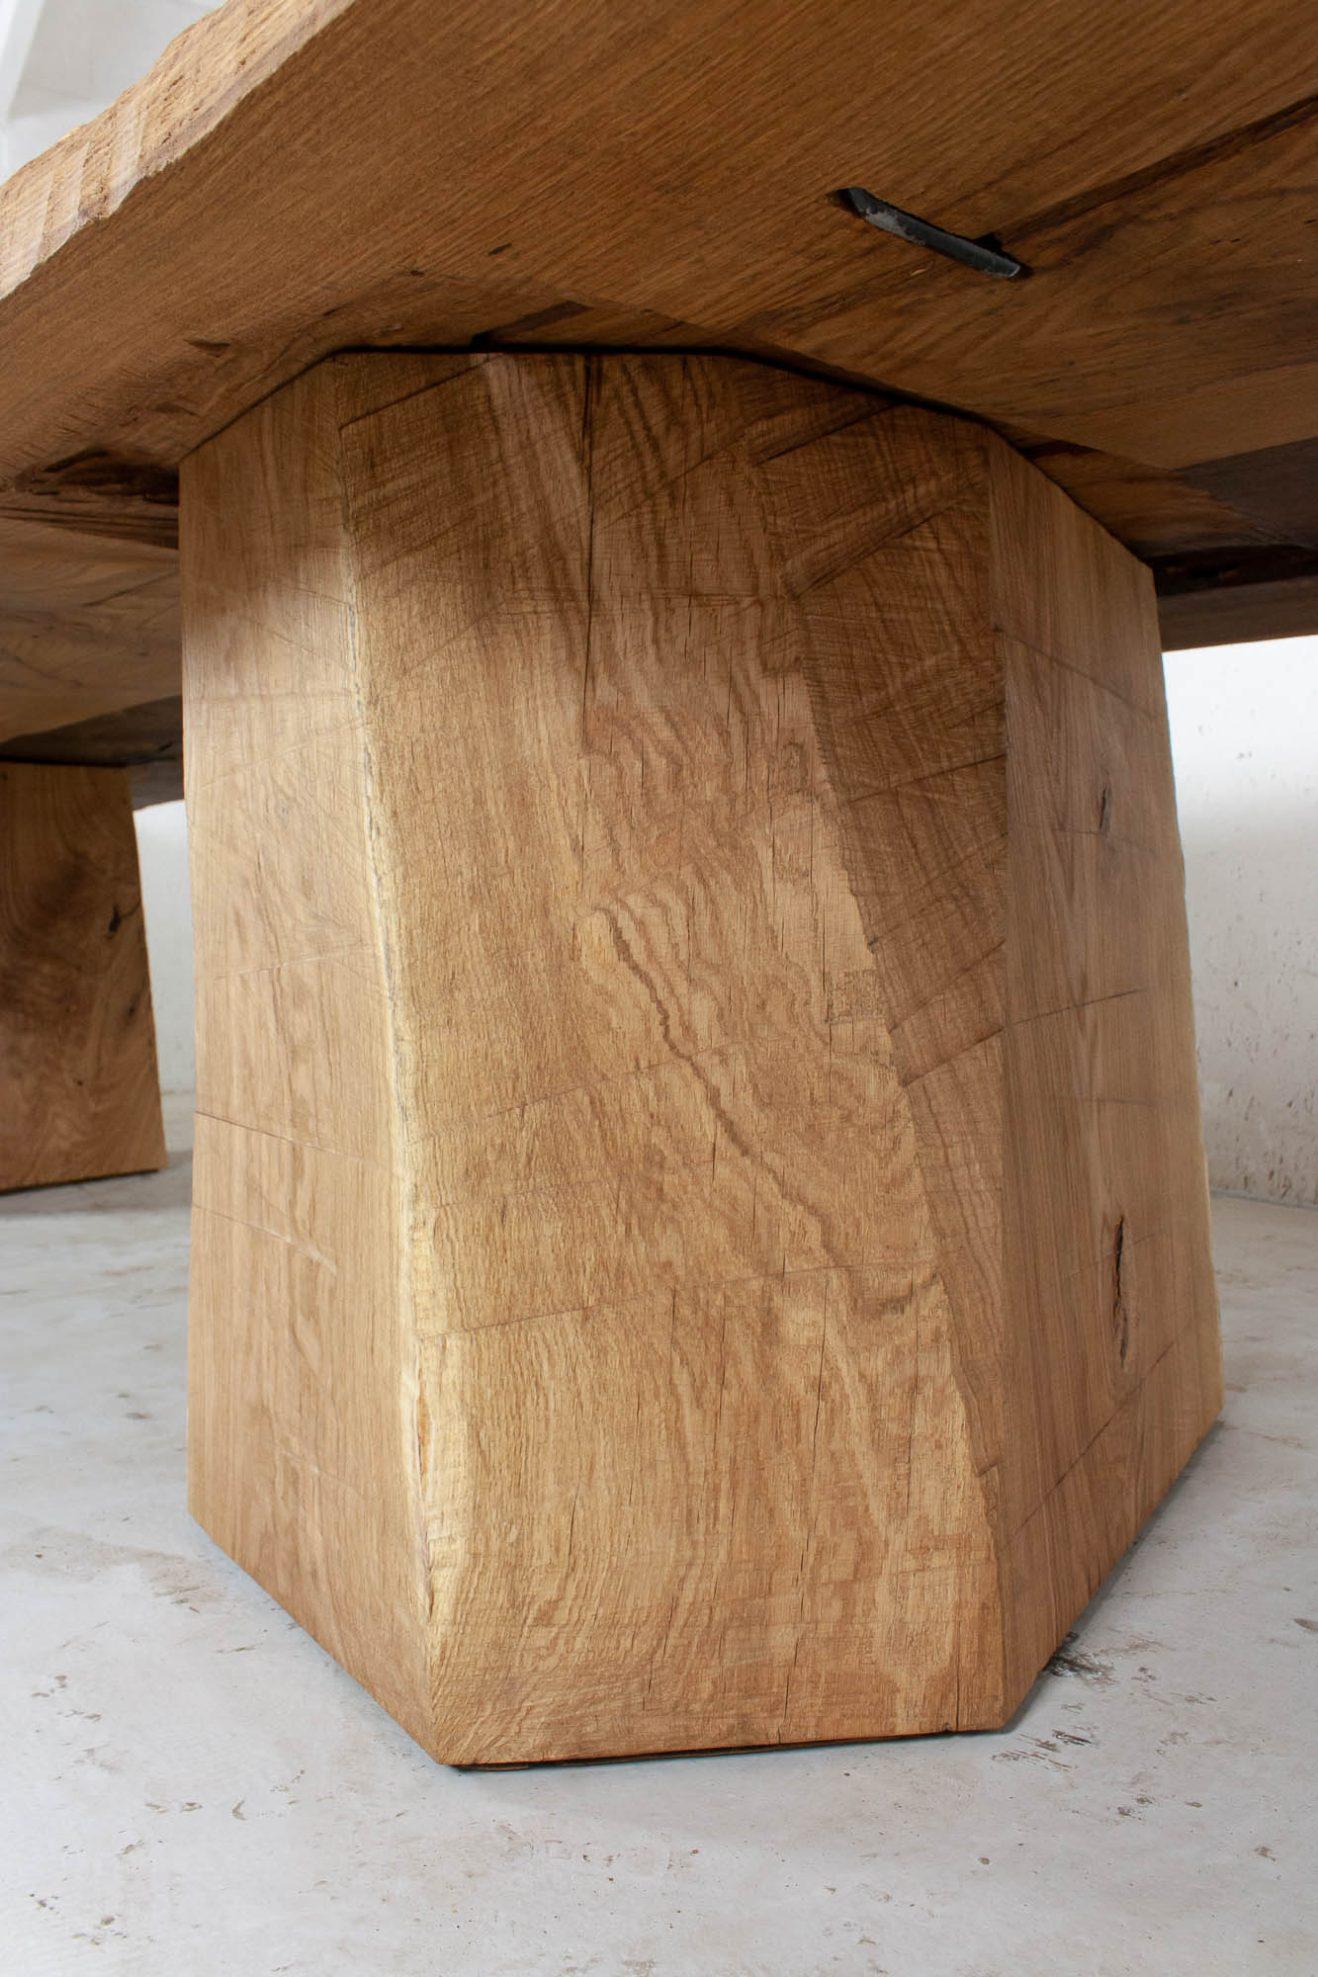 Massive Table #1 by Soha Concept, Denis Milovanov 4